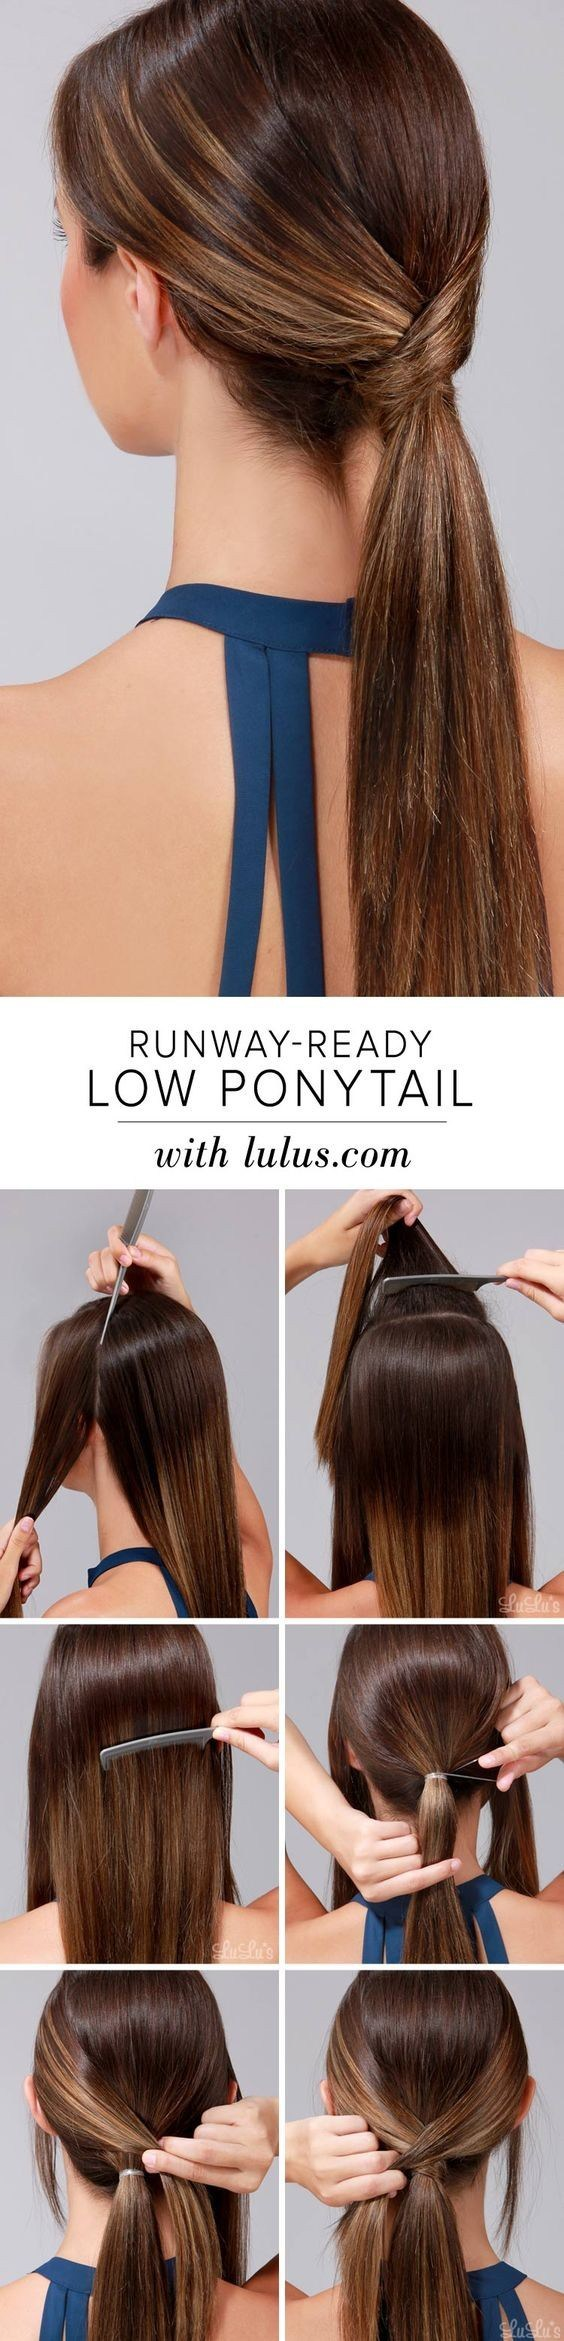 Причёска низкий хвост аля институтка hairstyle pinterest